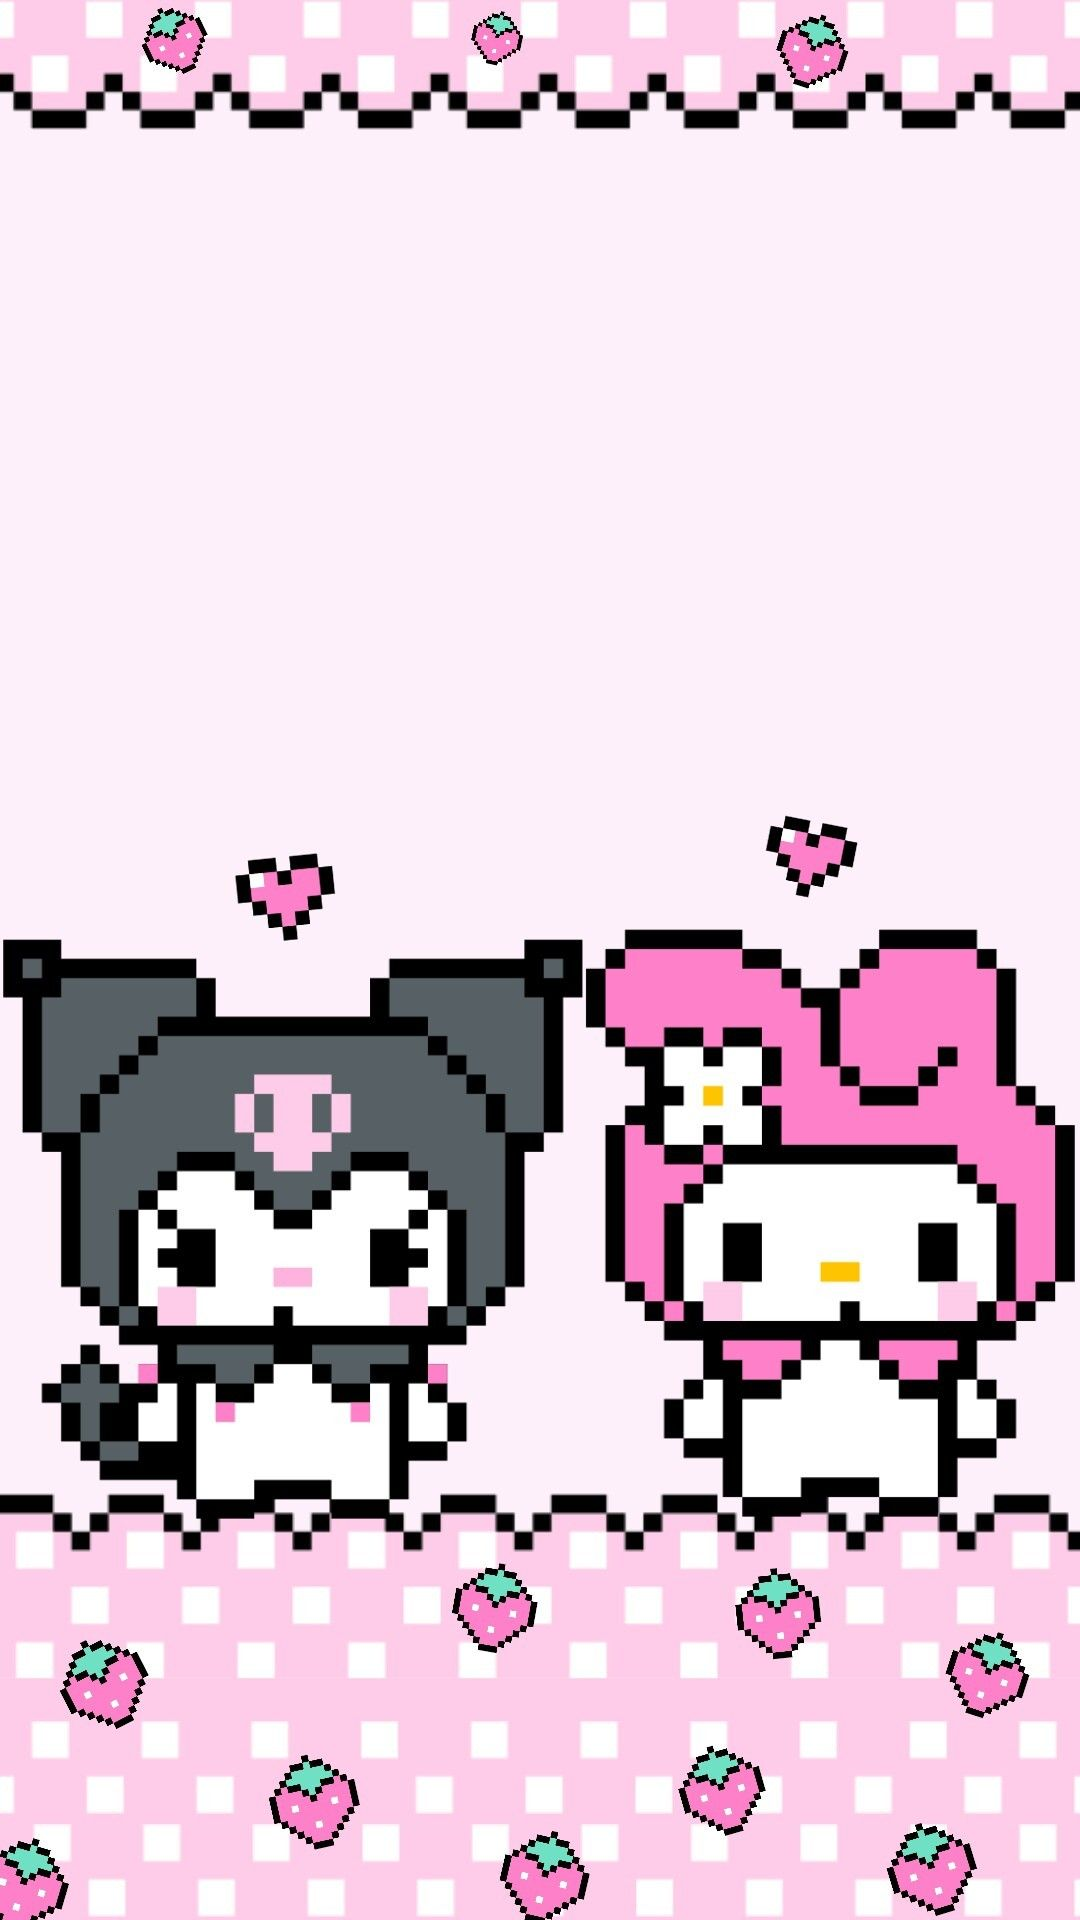 🌸sesshoumaru🌸 — Kuromi and My melody 8bit | Personal